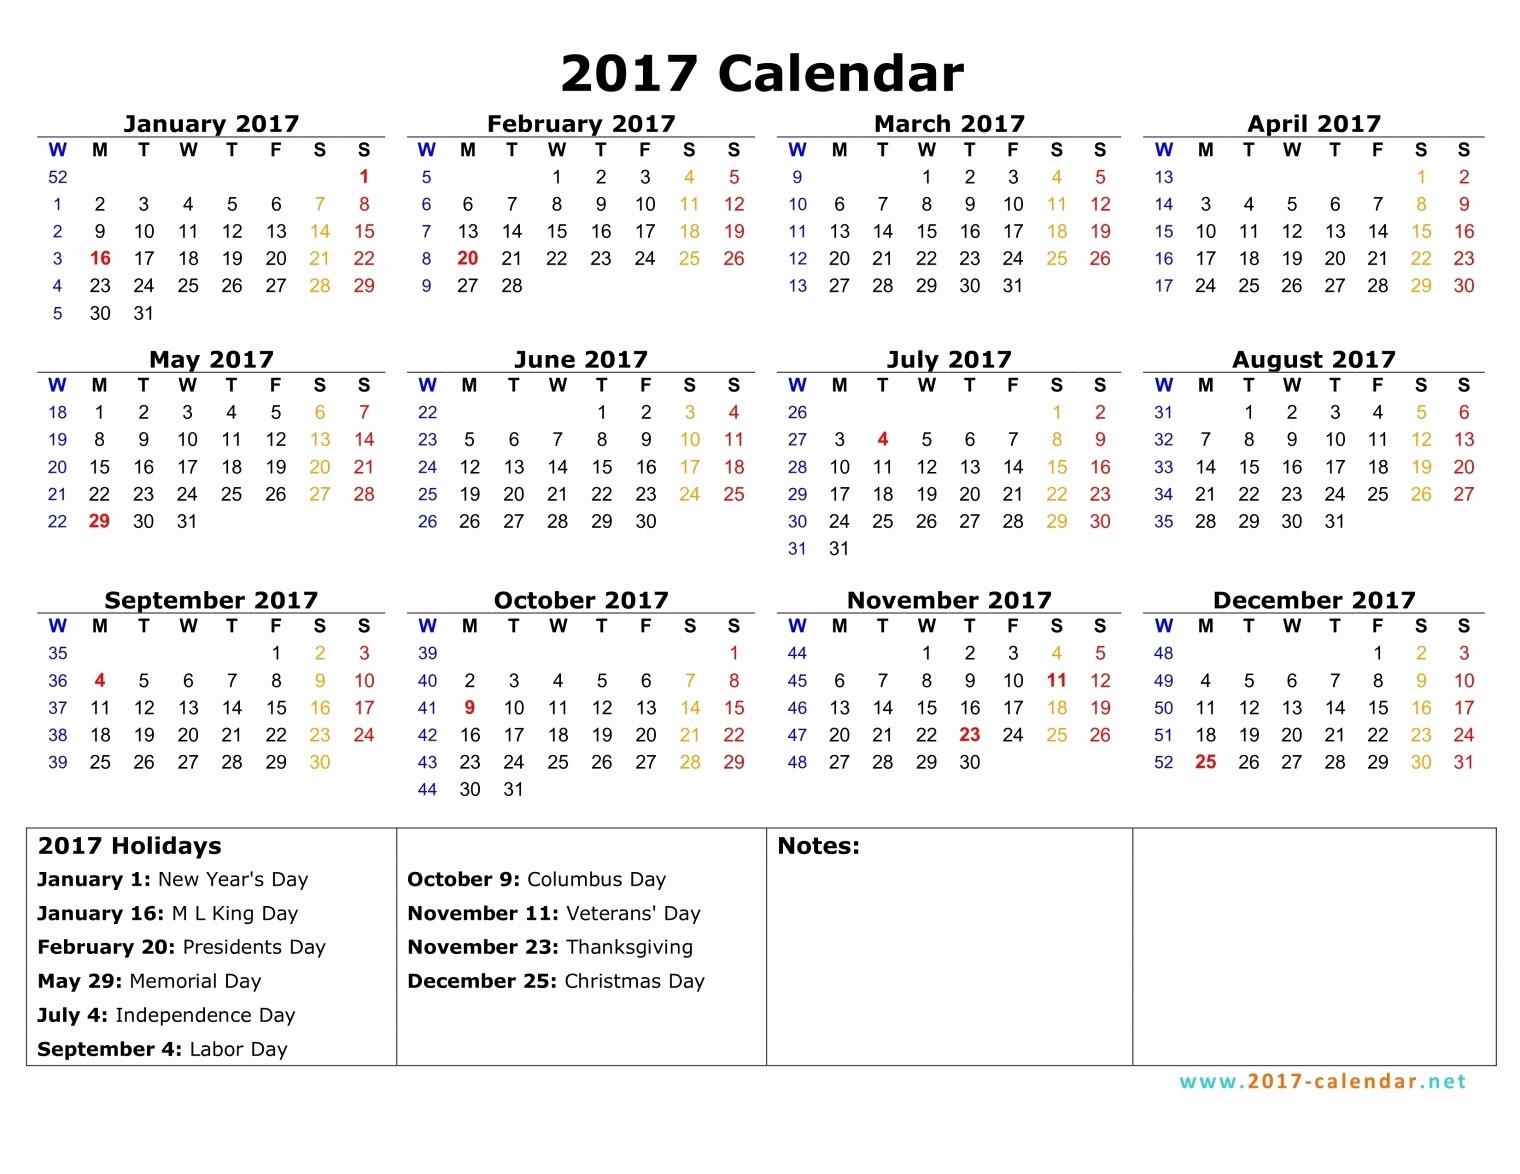 Monday to Sunday Calendar 2017 Elegant 2017 Calendar Monday to Friday